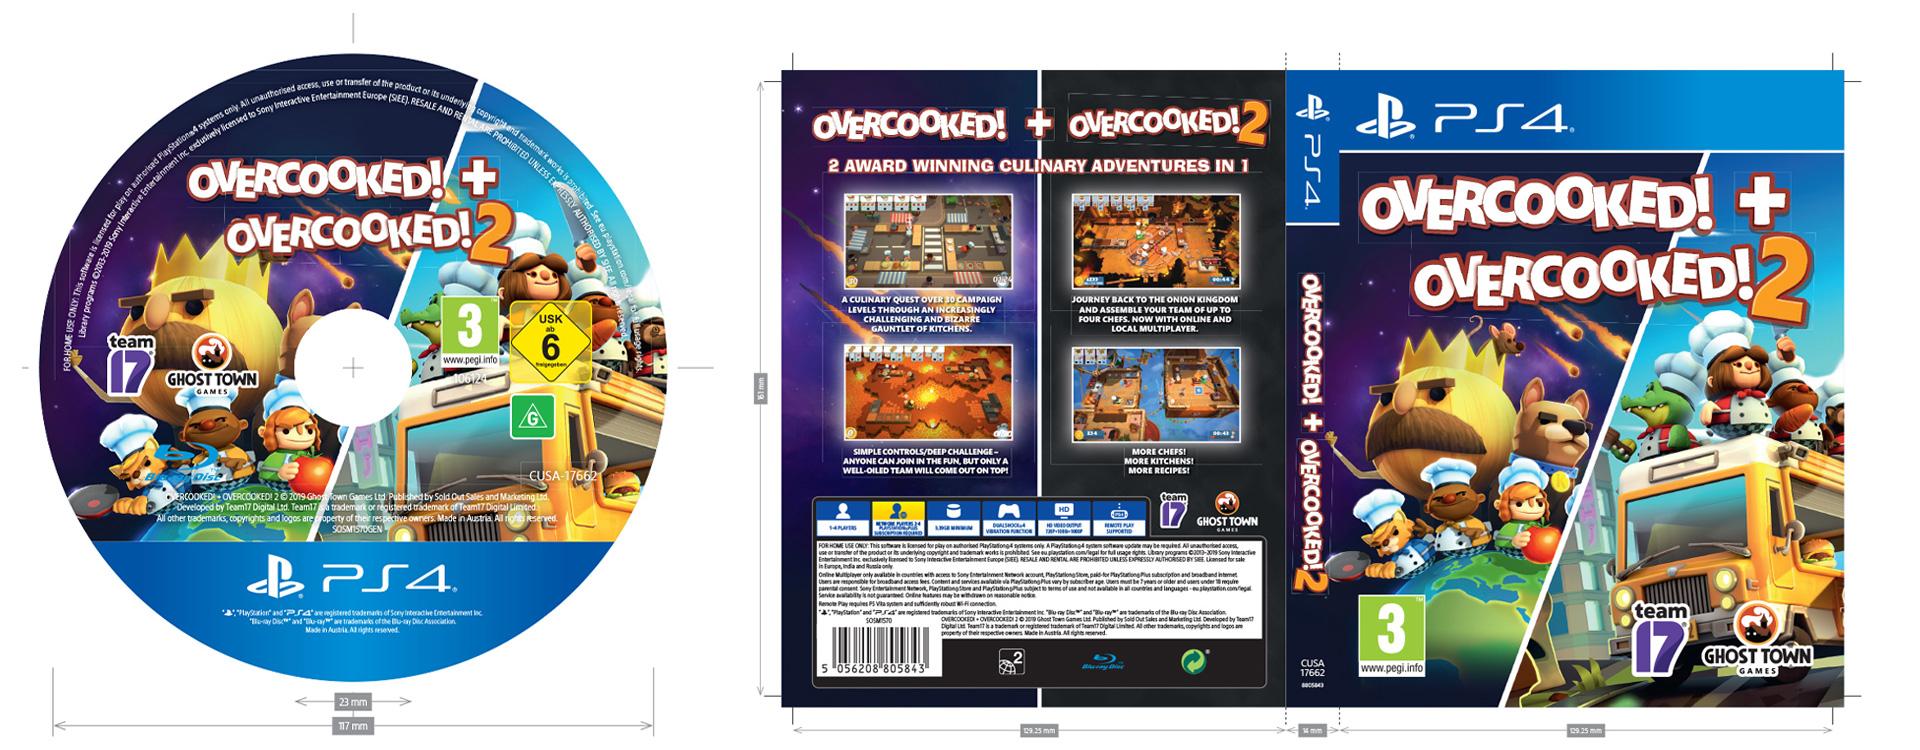 overcooked_reprographics_artwork_videogame